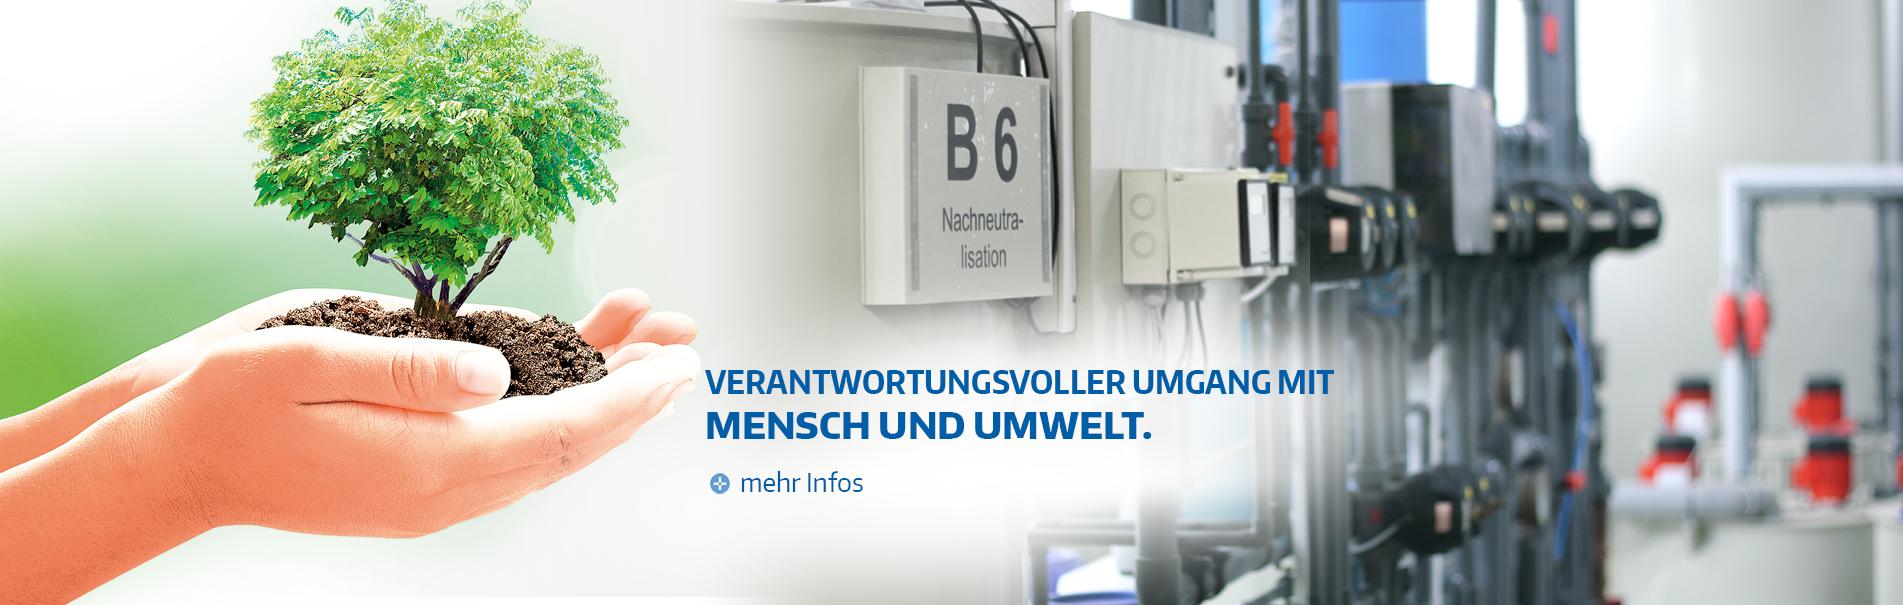 Tehrotech GmbH – Nachhaltigkeit